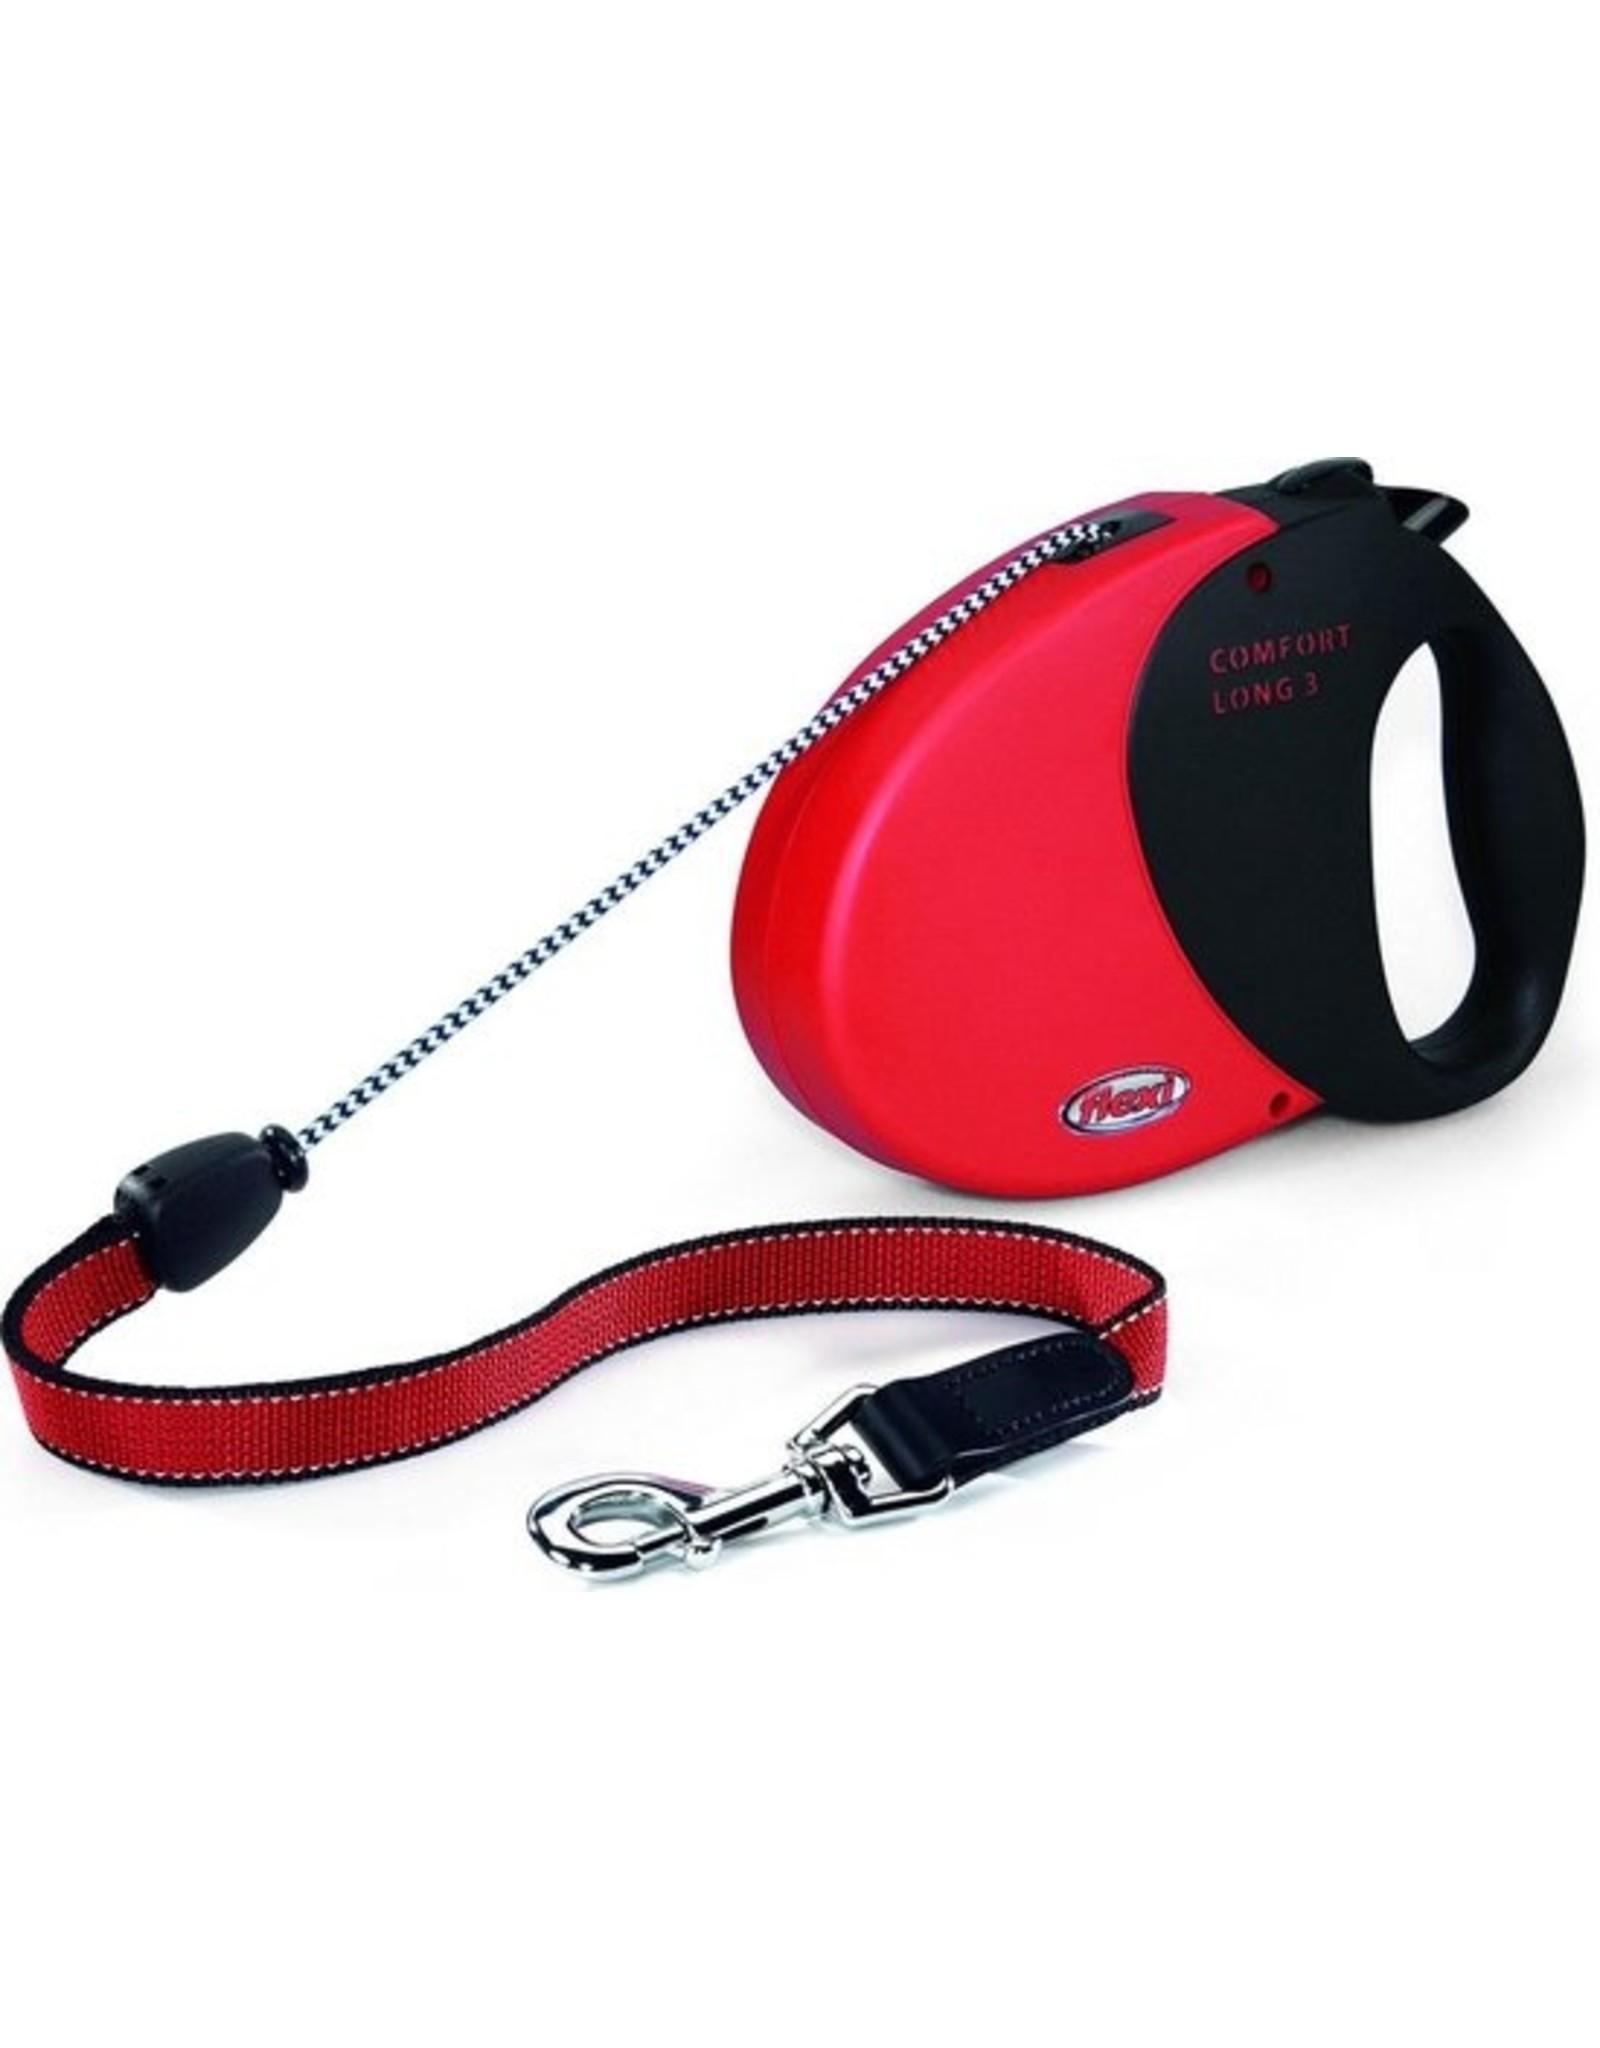 flexi Flexi Comfort Compact rood koord 5m reflect L